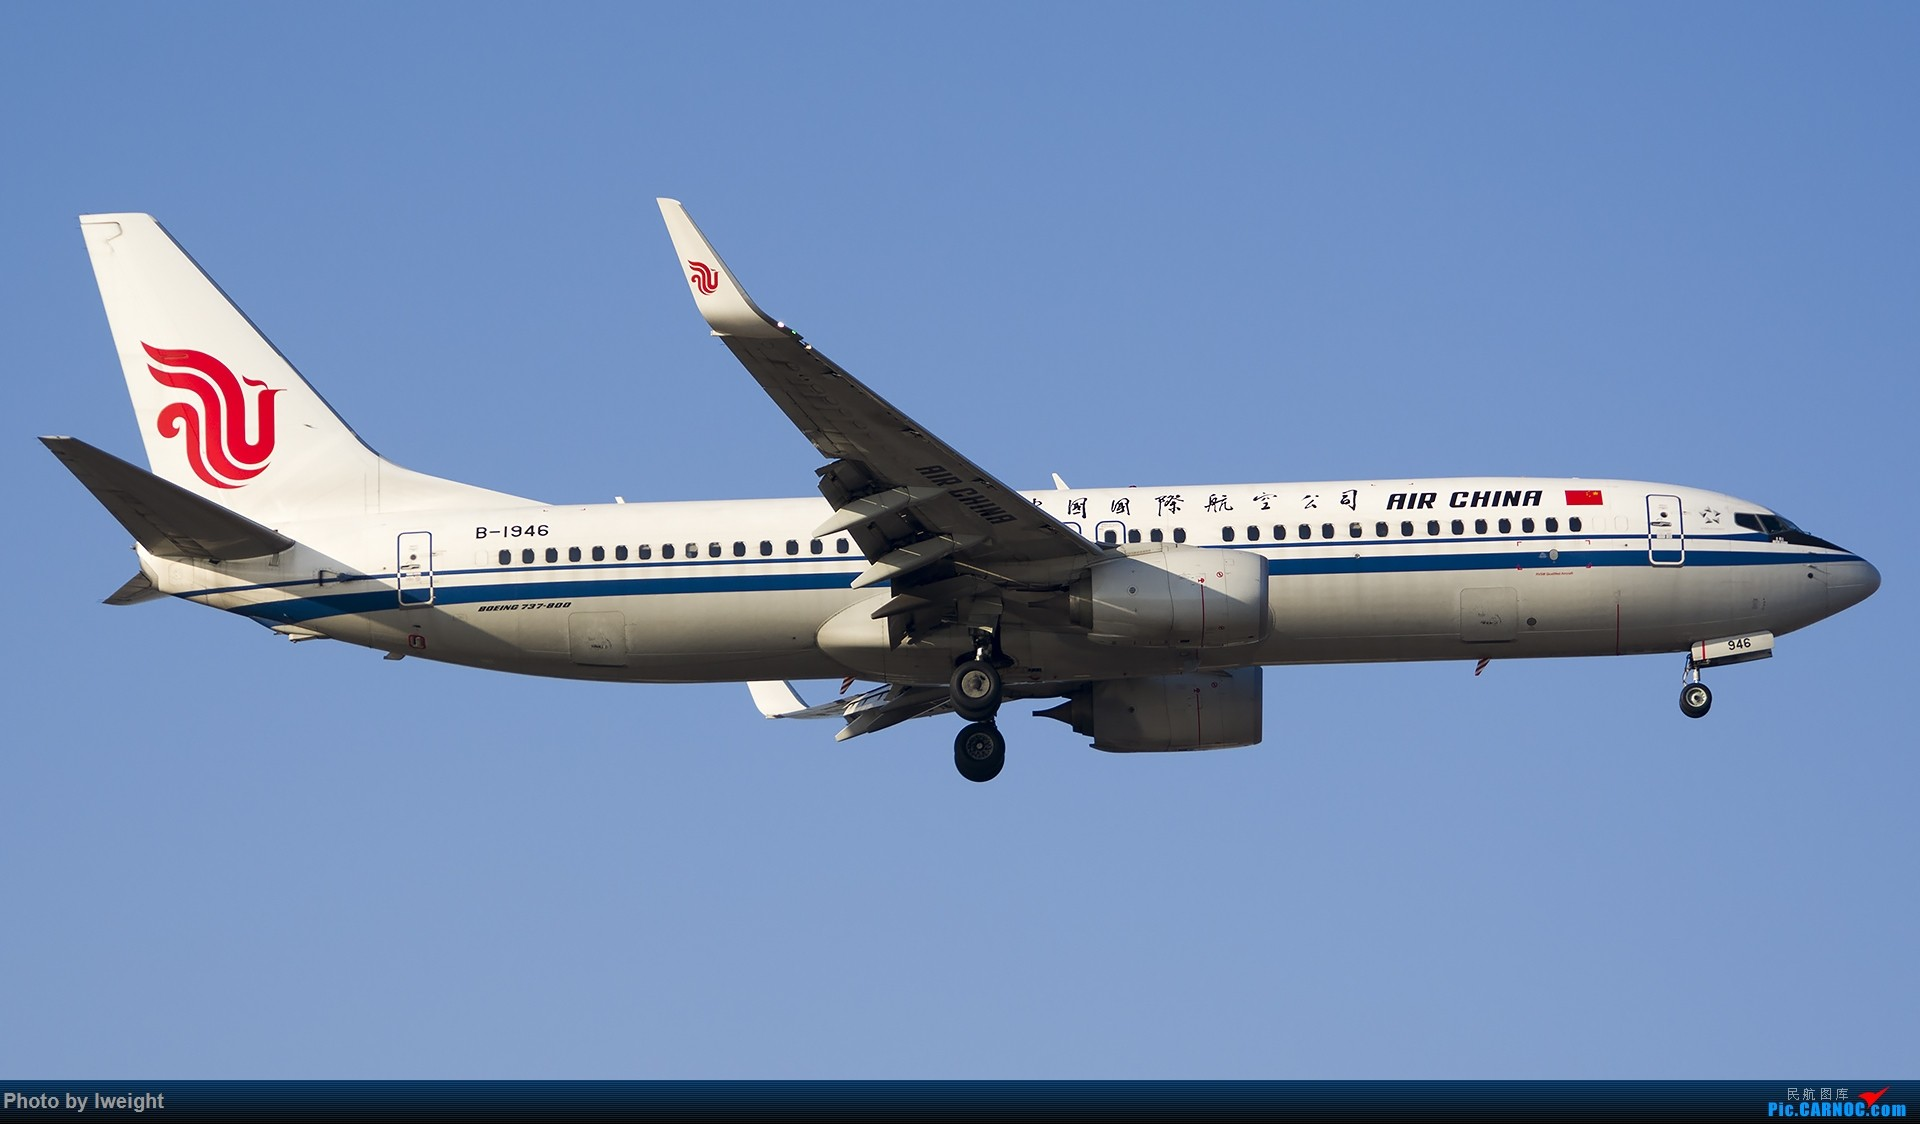 Re:[原创]庆祝升级777,发上今天在首都机场拍的所有飞机【2014-12-14】 BOEING 737-800 B-1946 中国北京首都国际机场